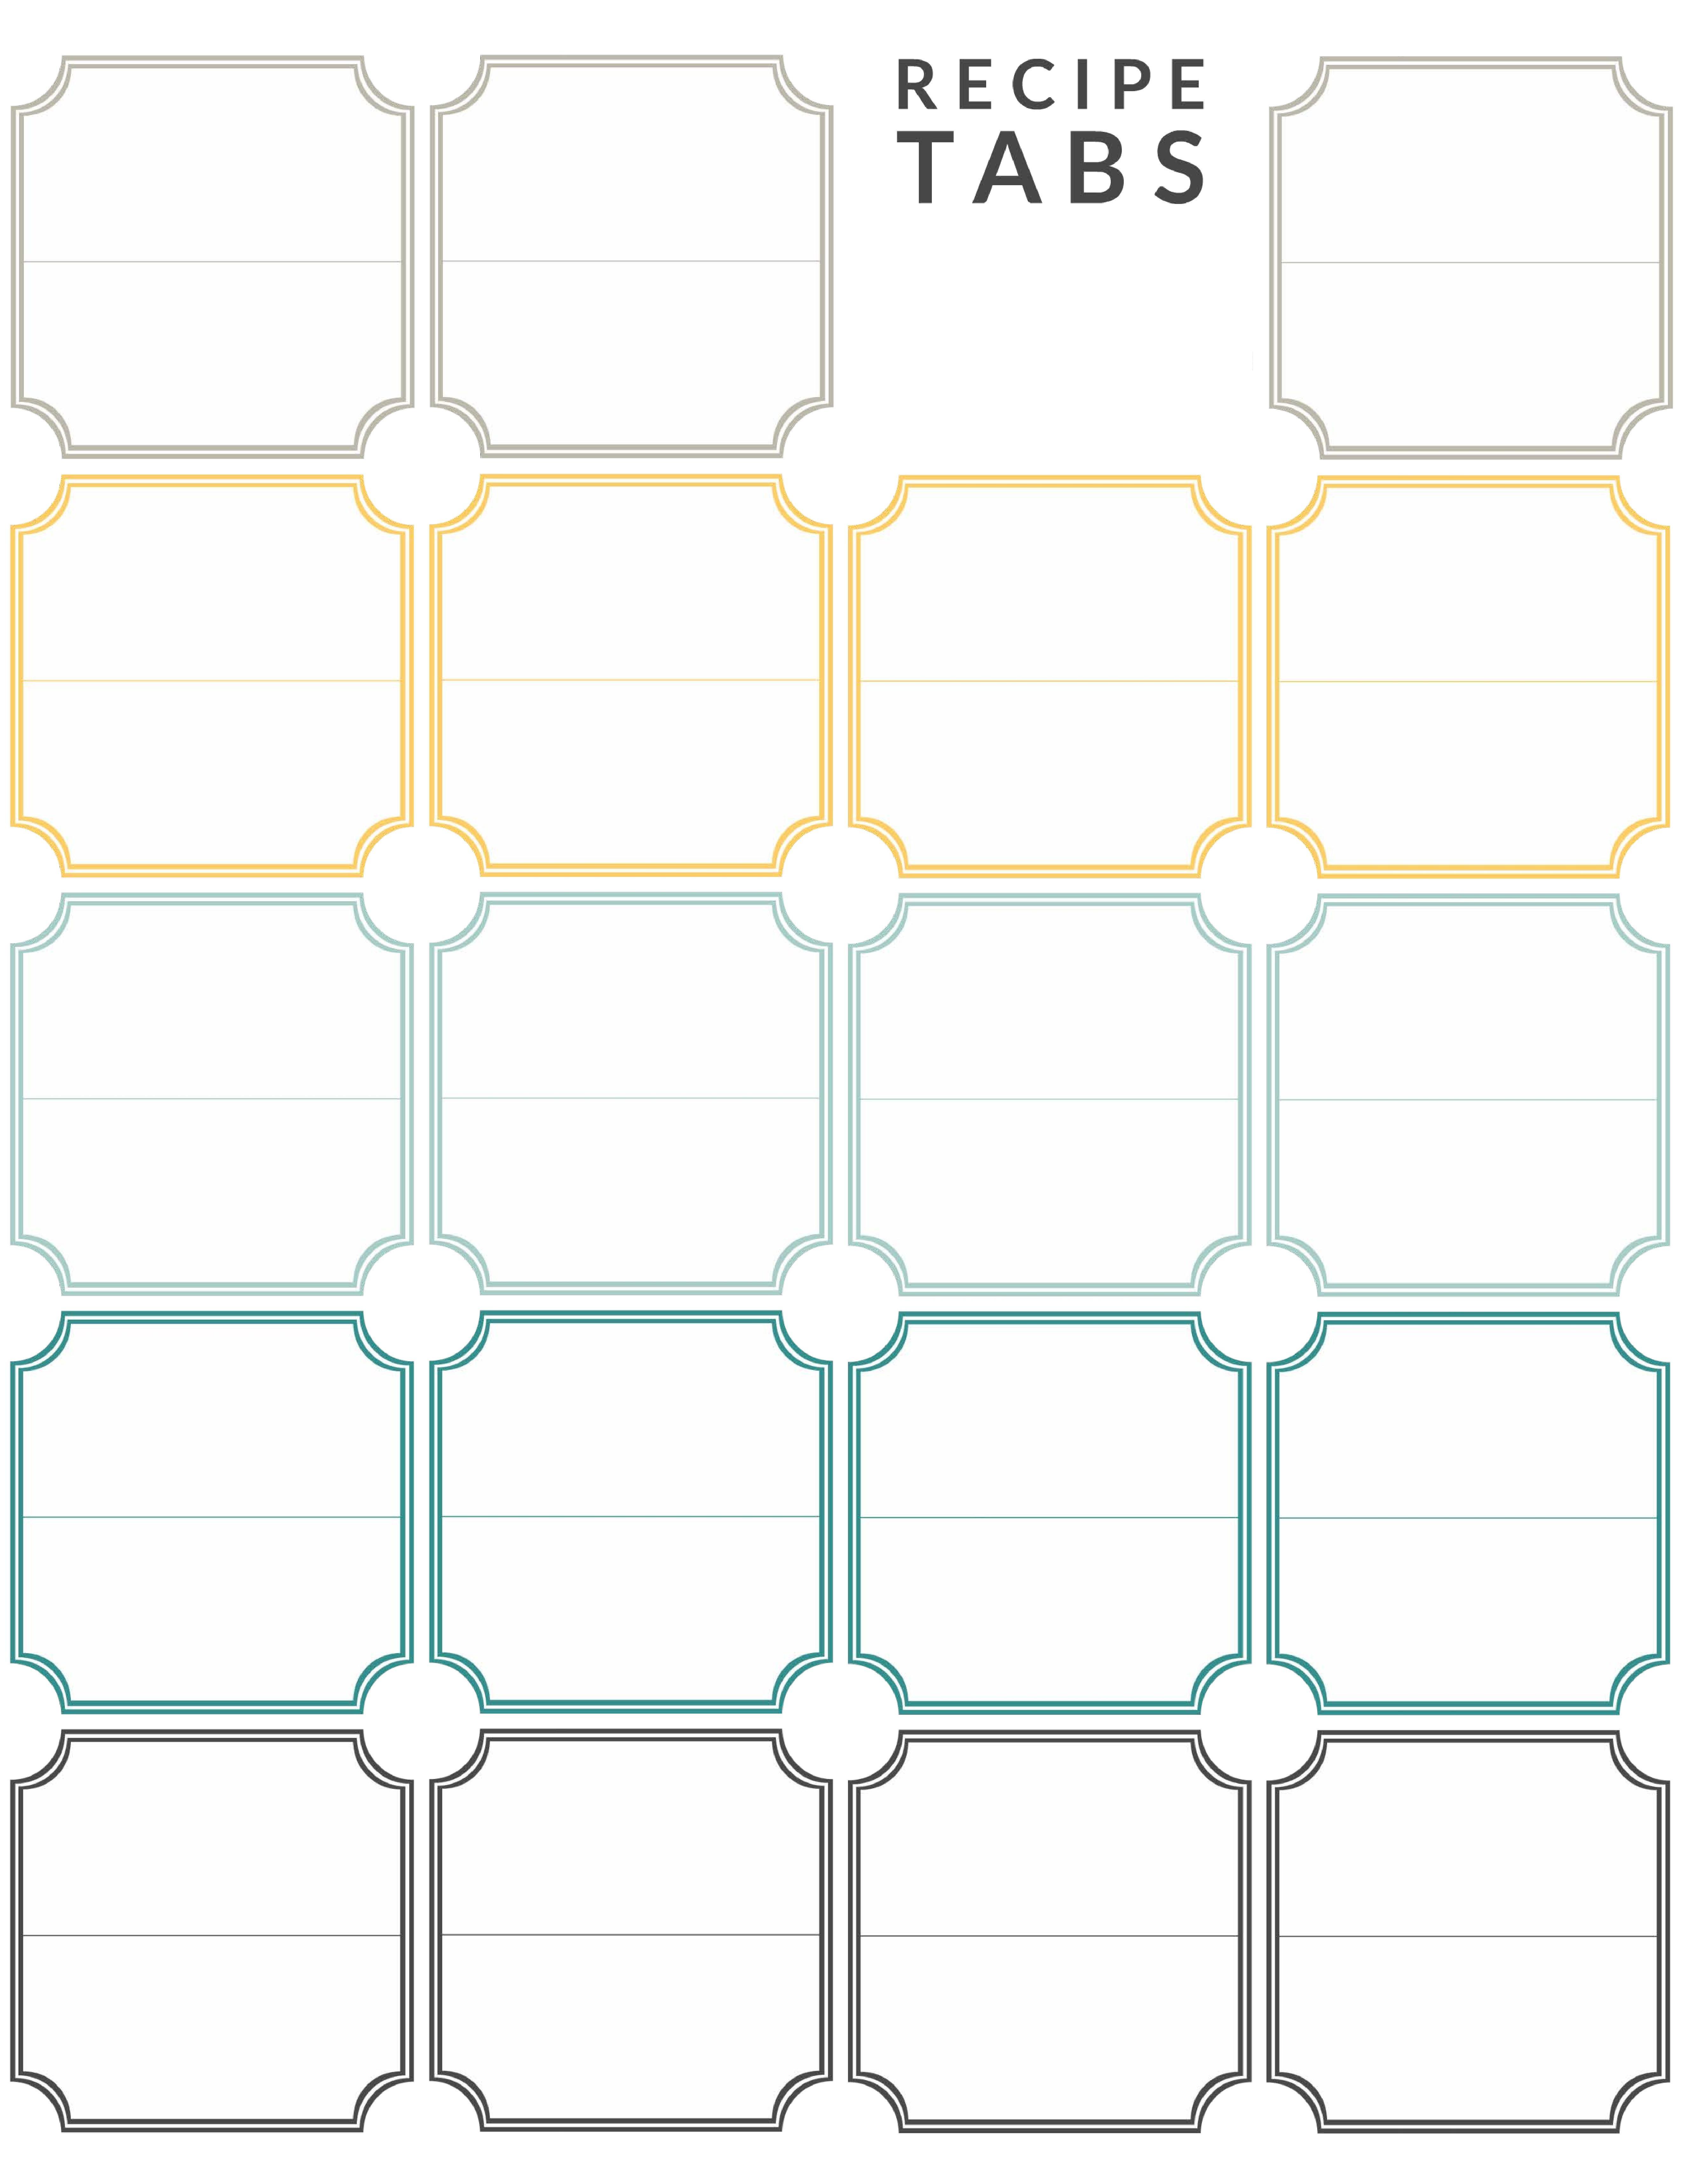 Diy Recipe Binder (With Free Printable Downloads) - Free Printable Tabs For Binders